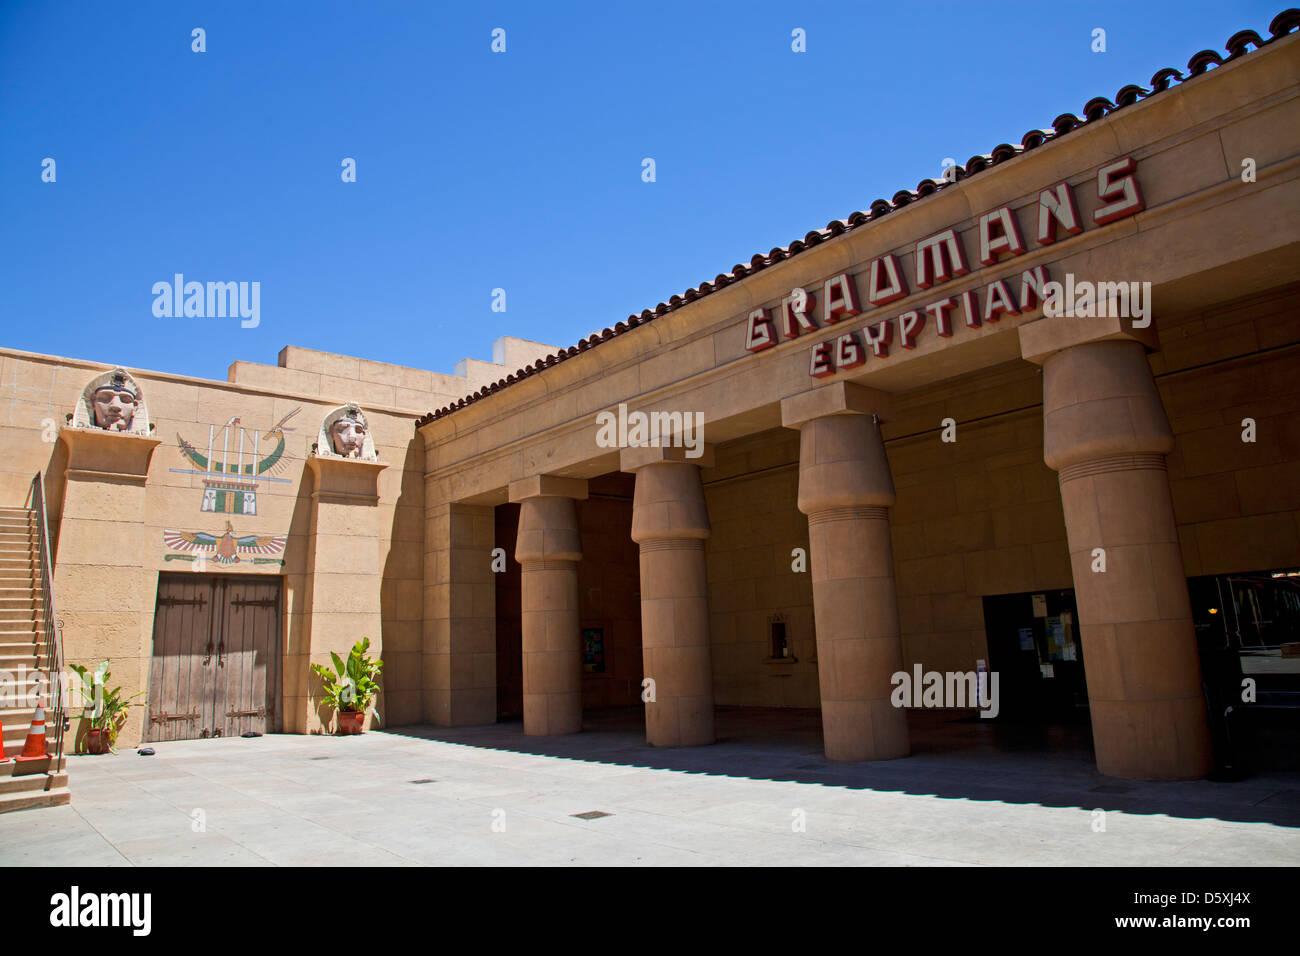 Graumans Egyptian Theatre, Hollywood Blvd, Los Angeles, California, USA - Stock Image